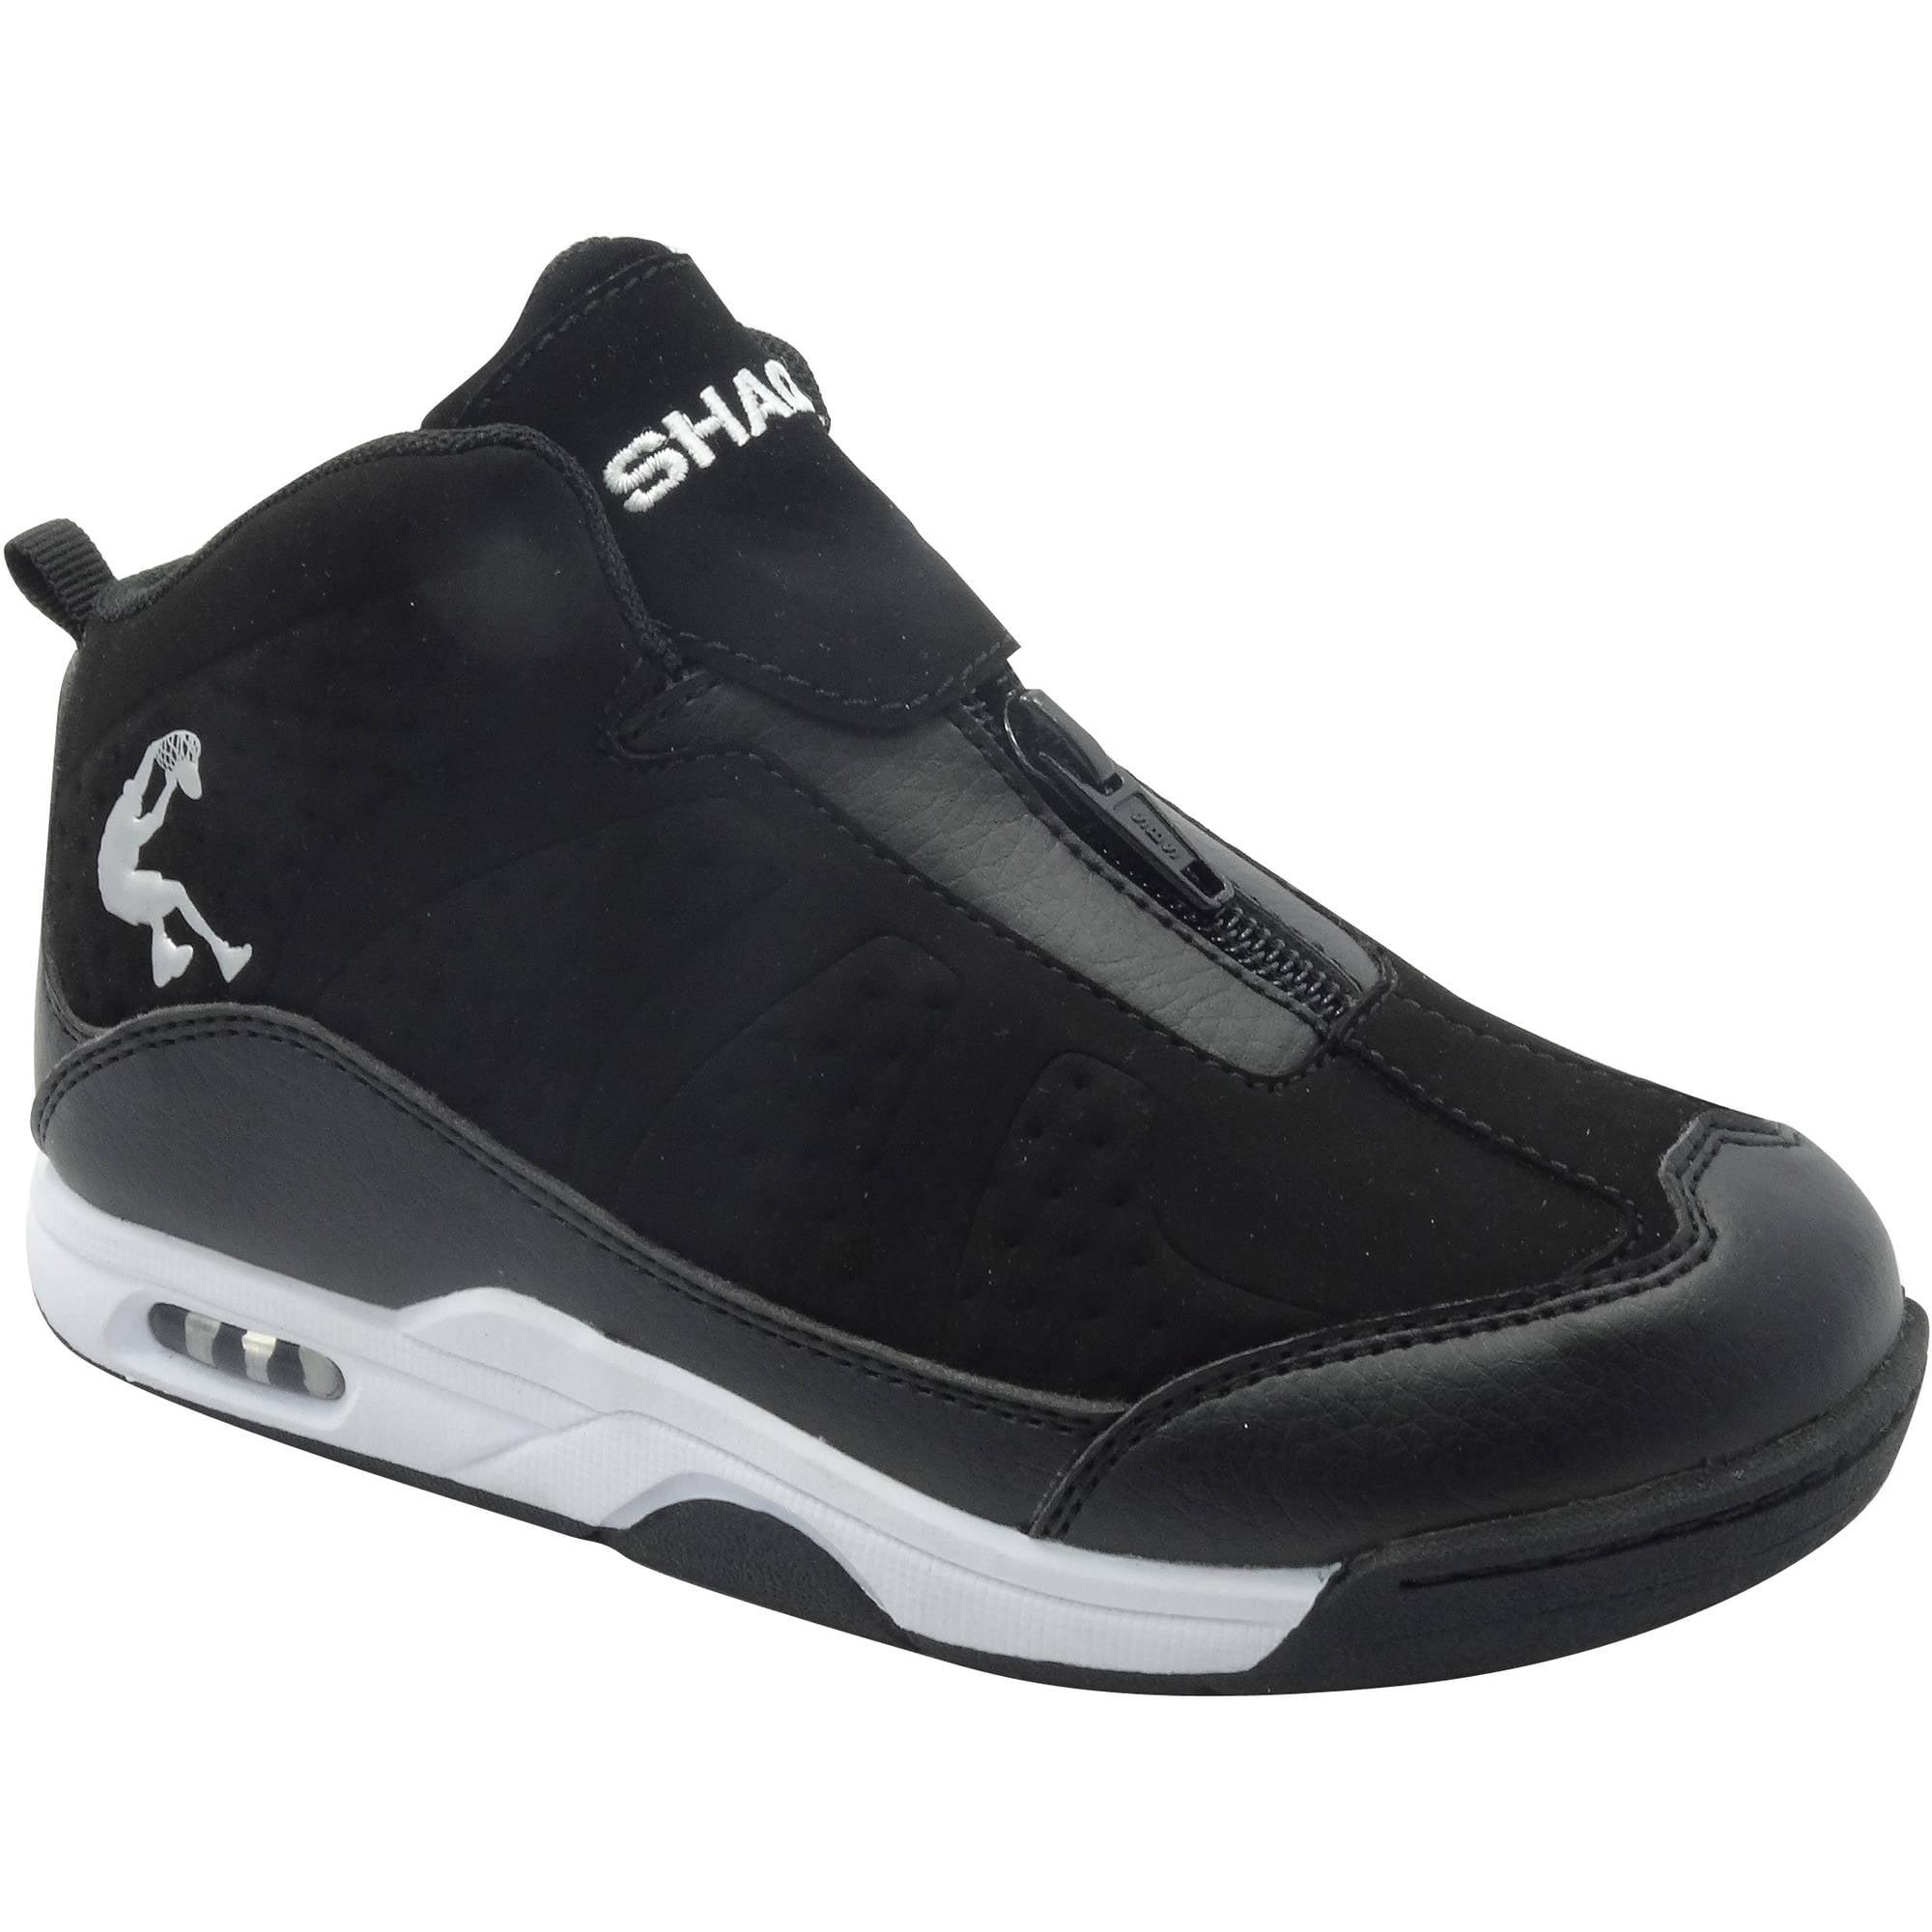 Shaq Boys Athletic Zip Shoe Product